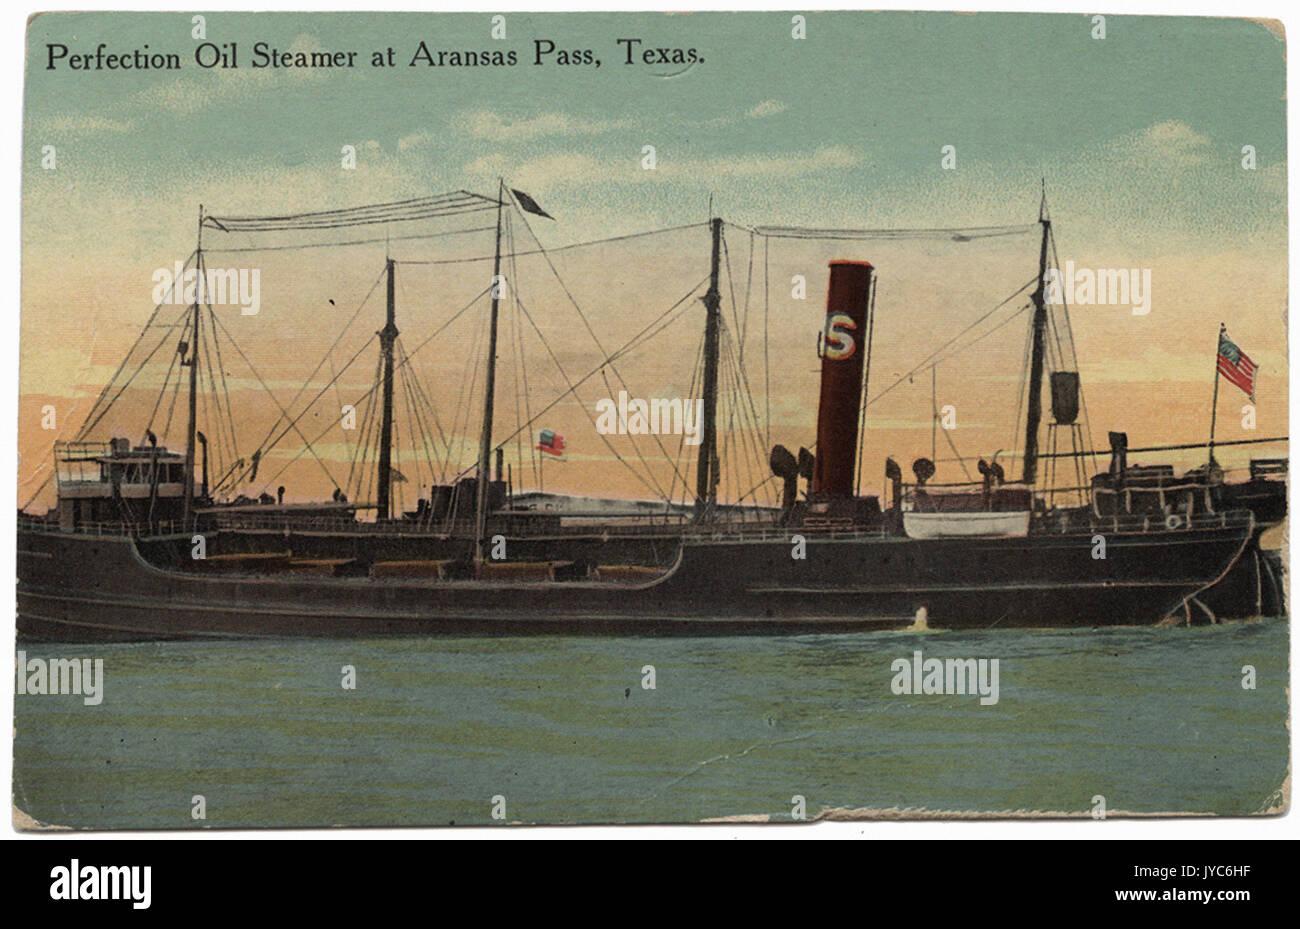 Perfection Oil Steamer at Aransas Pass, Texas. - Stock Image